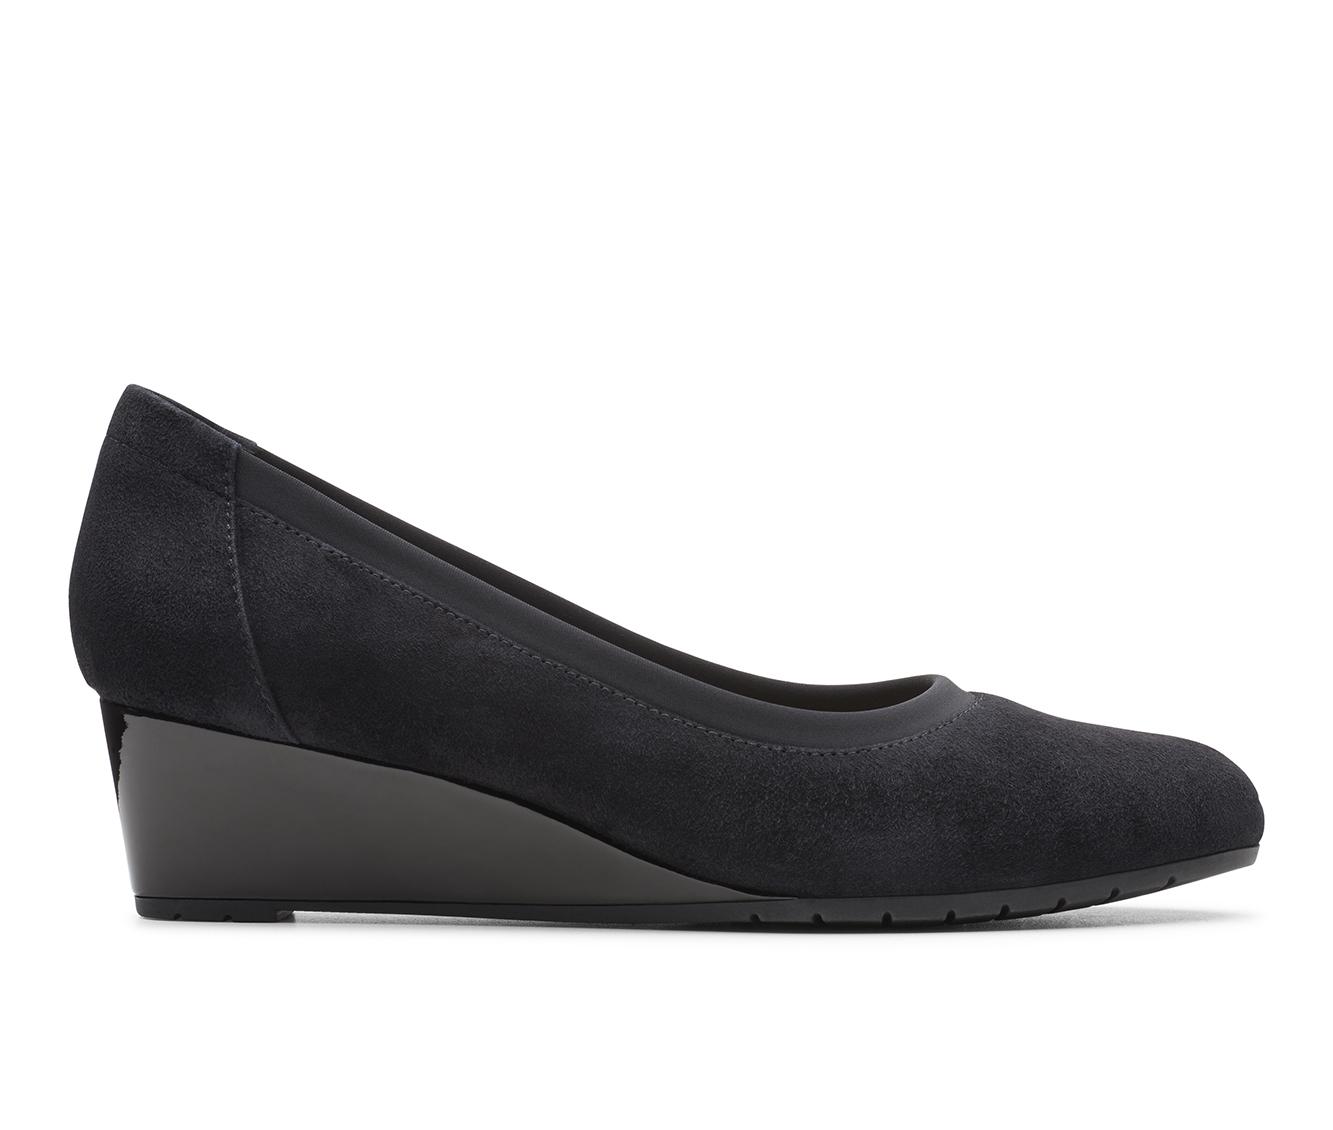 Clarks Mallory Berry Women's Dress Shoe (Black Leather)